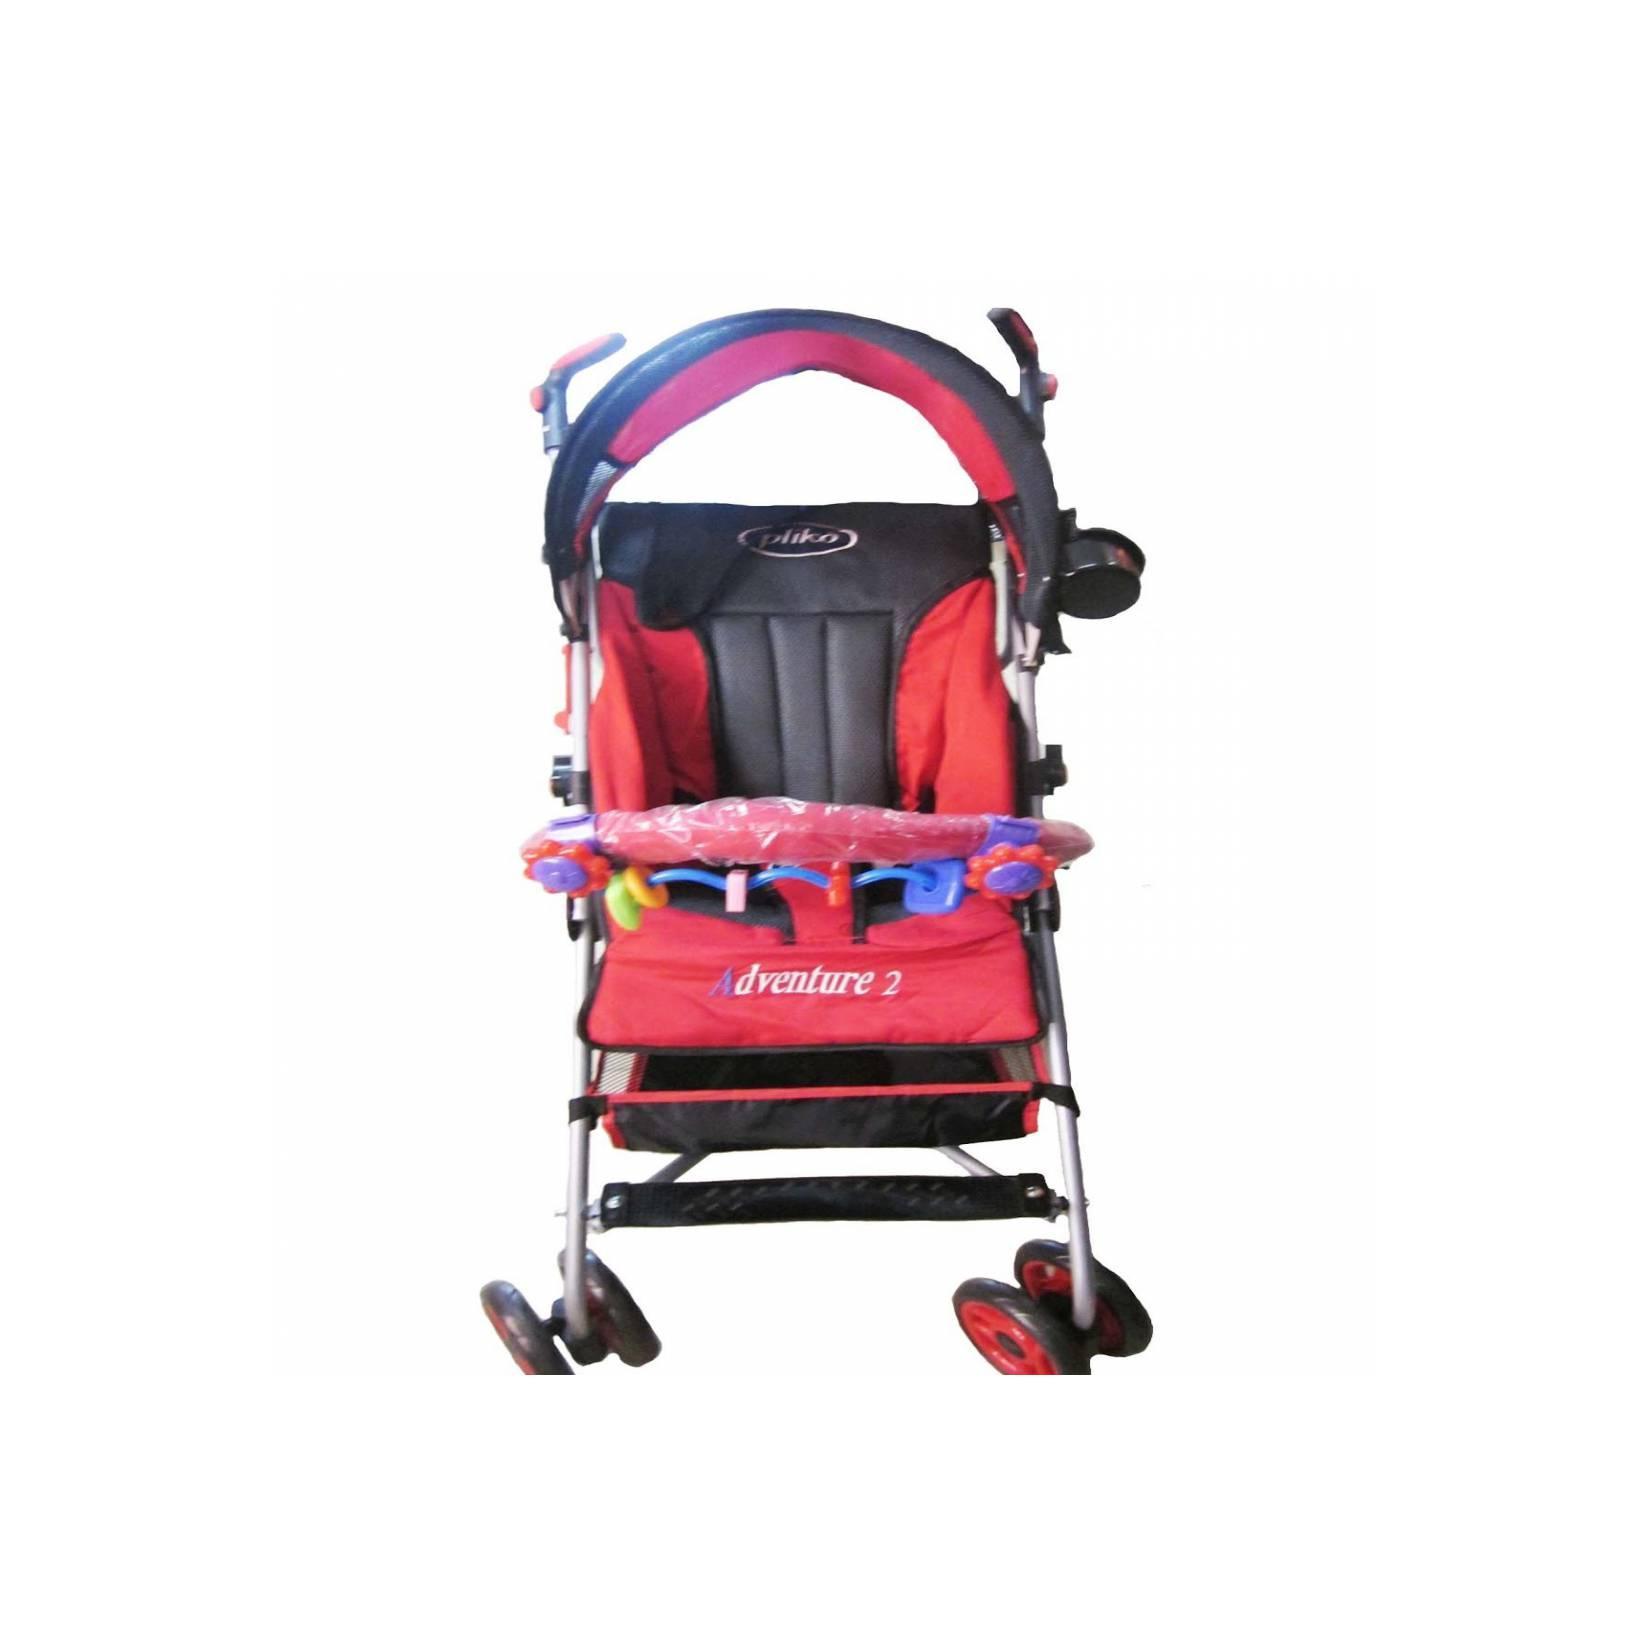 Stroller Pliko Adventure 2 kereta dorong bayi yangb bagus multifungsi